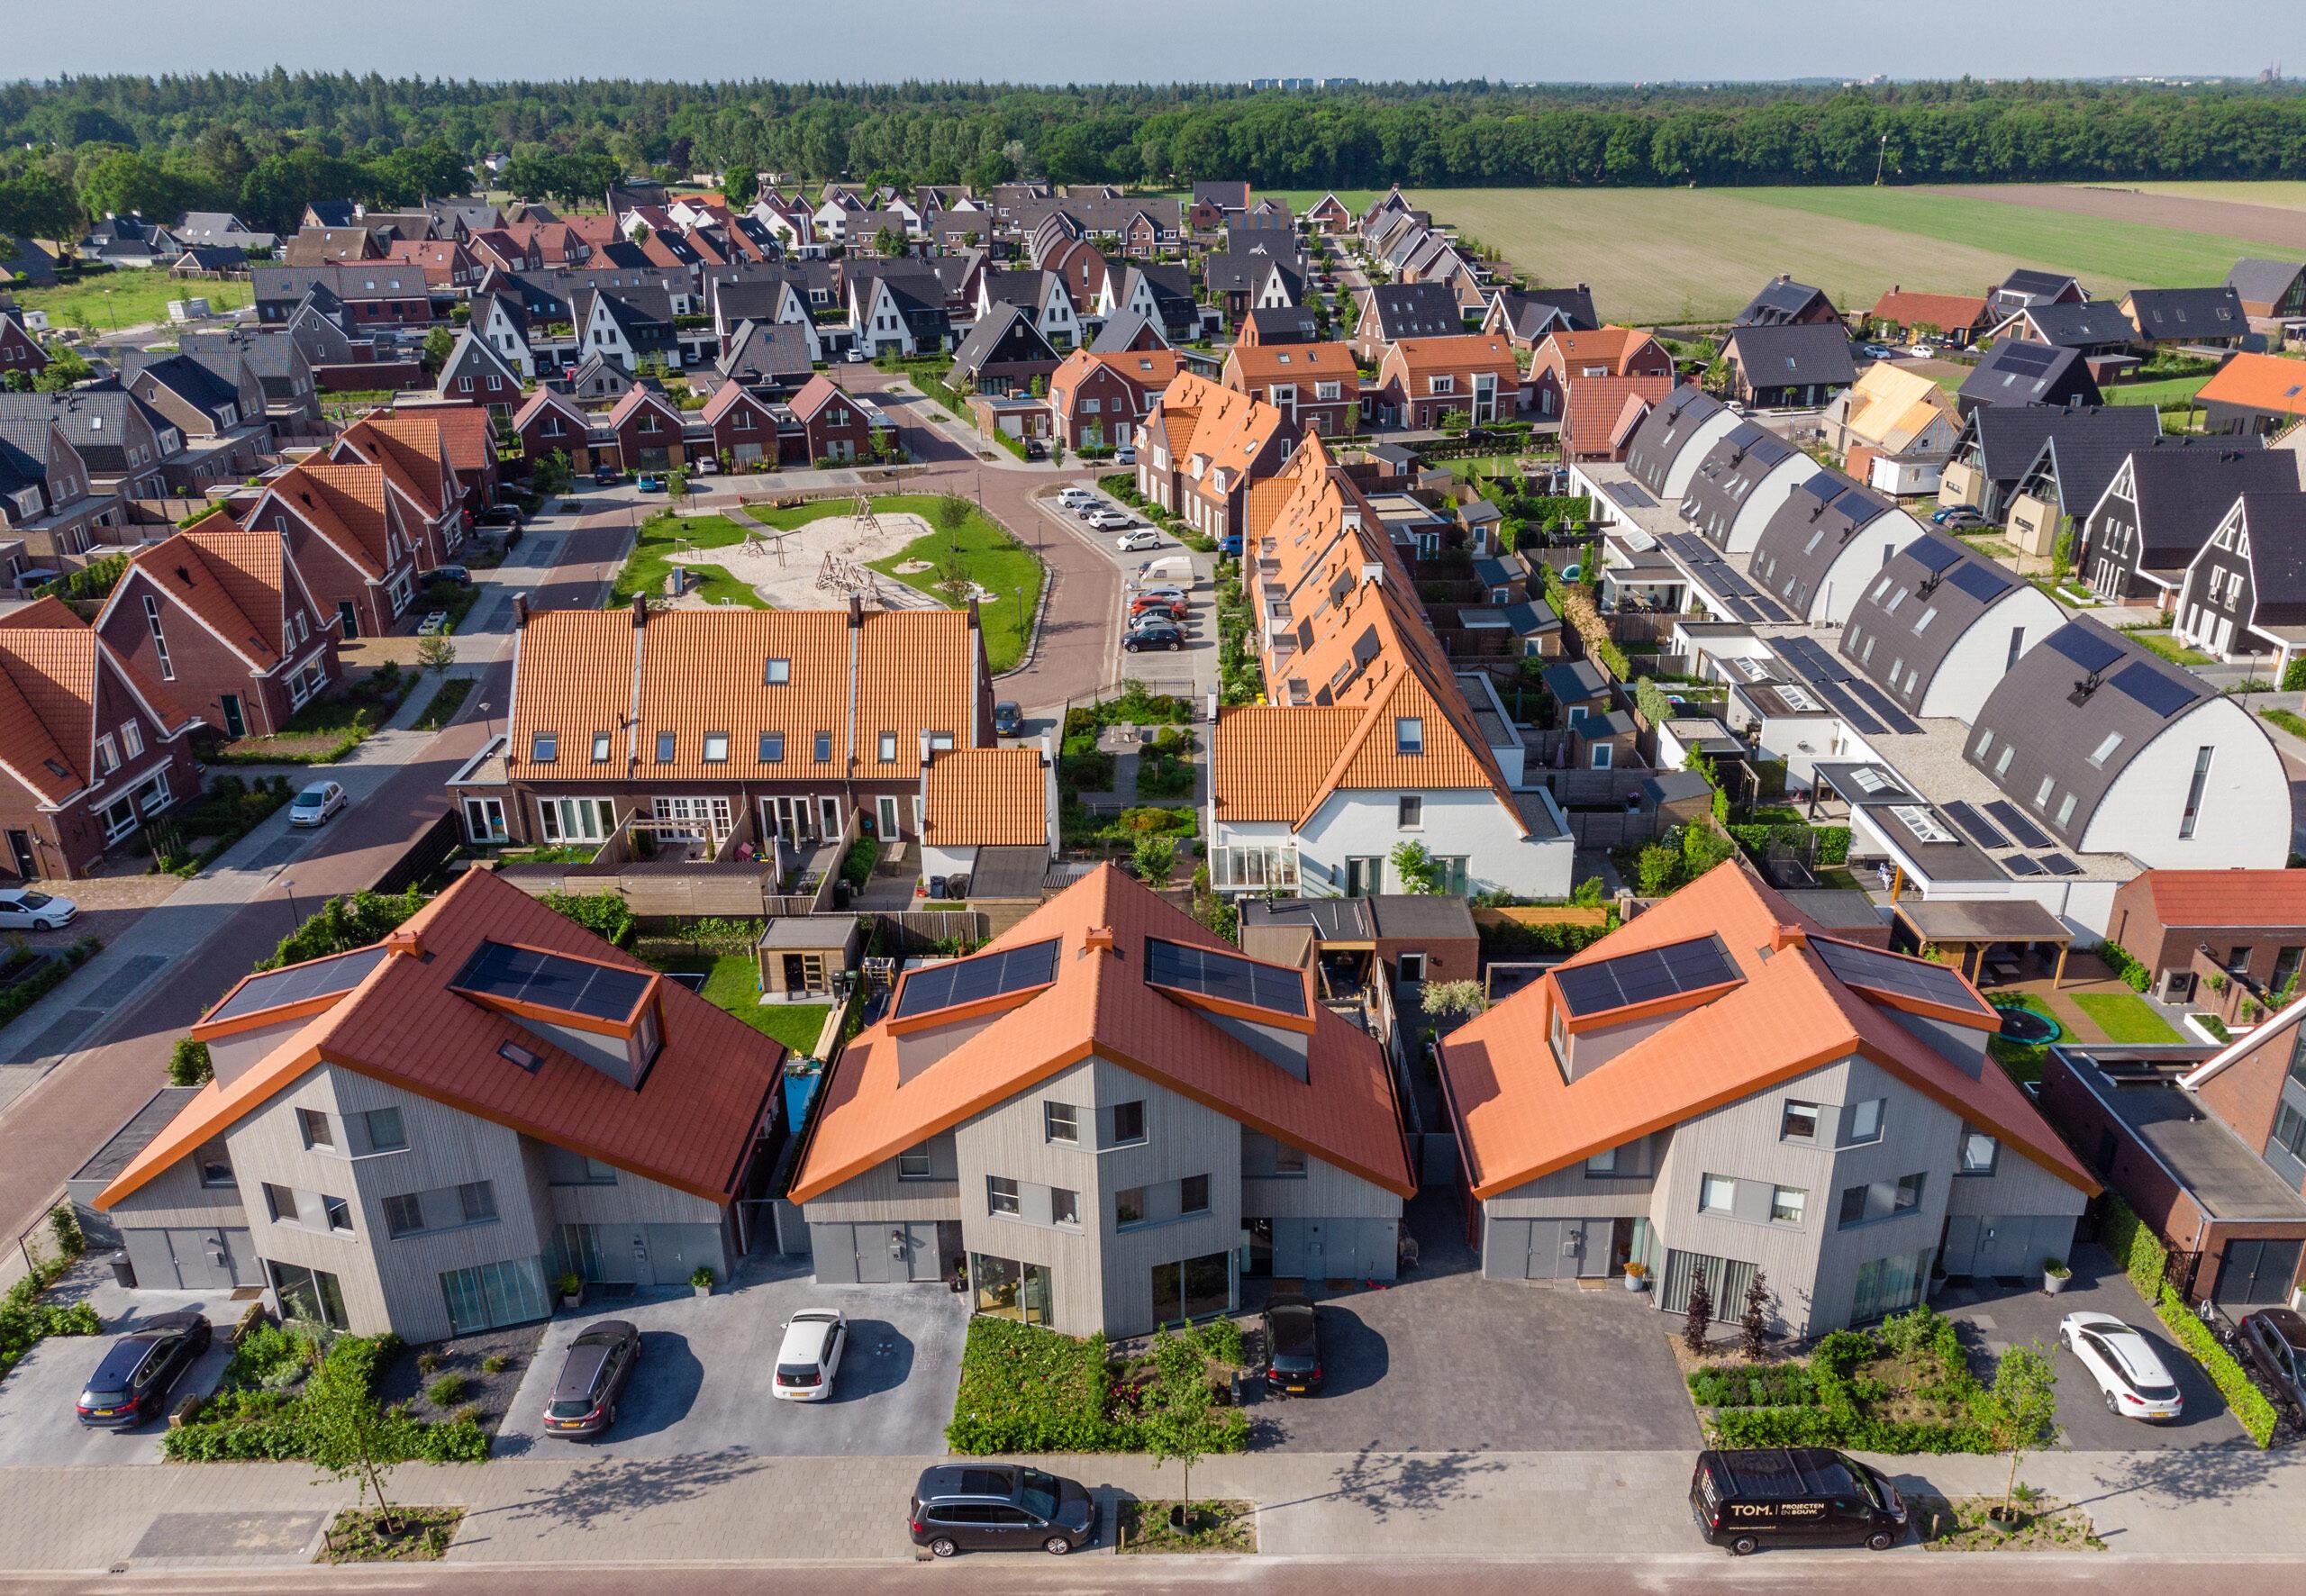 Helmond Mierlo Hout PV panelen zonnepanelen warmtepomp houten gevel baksteen Brabant landschap